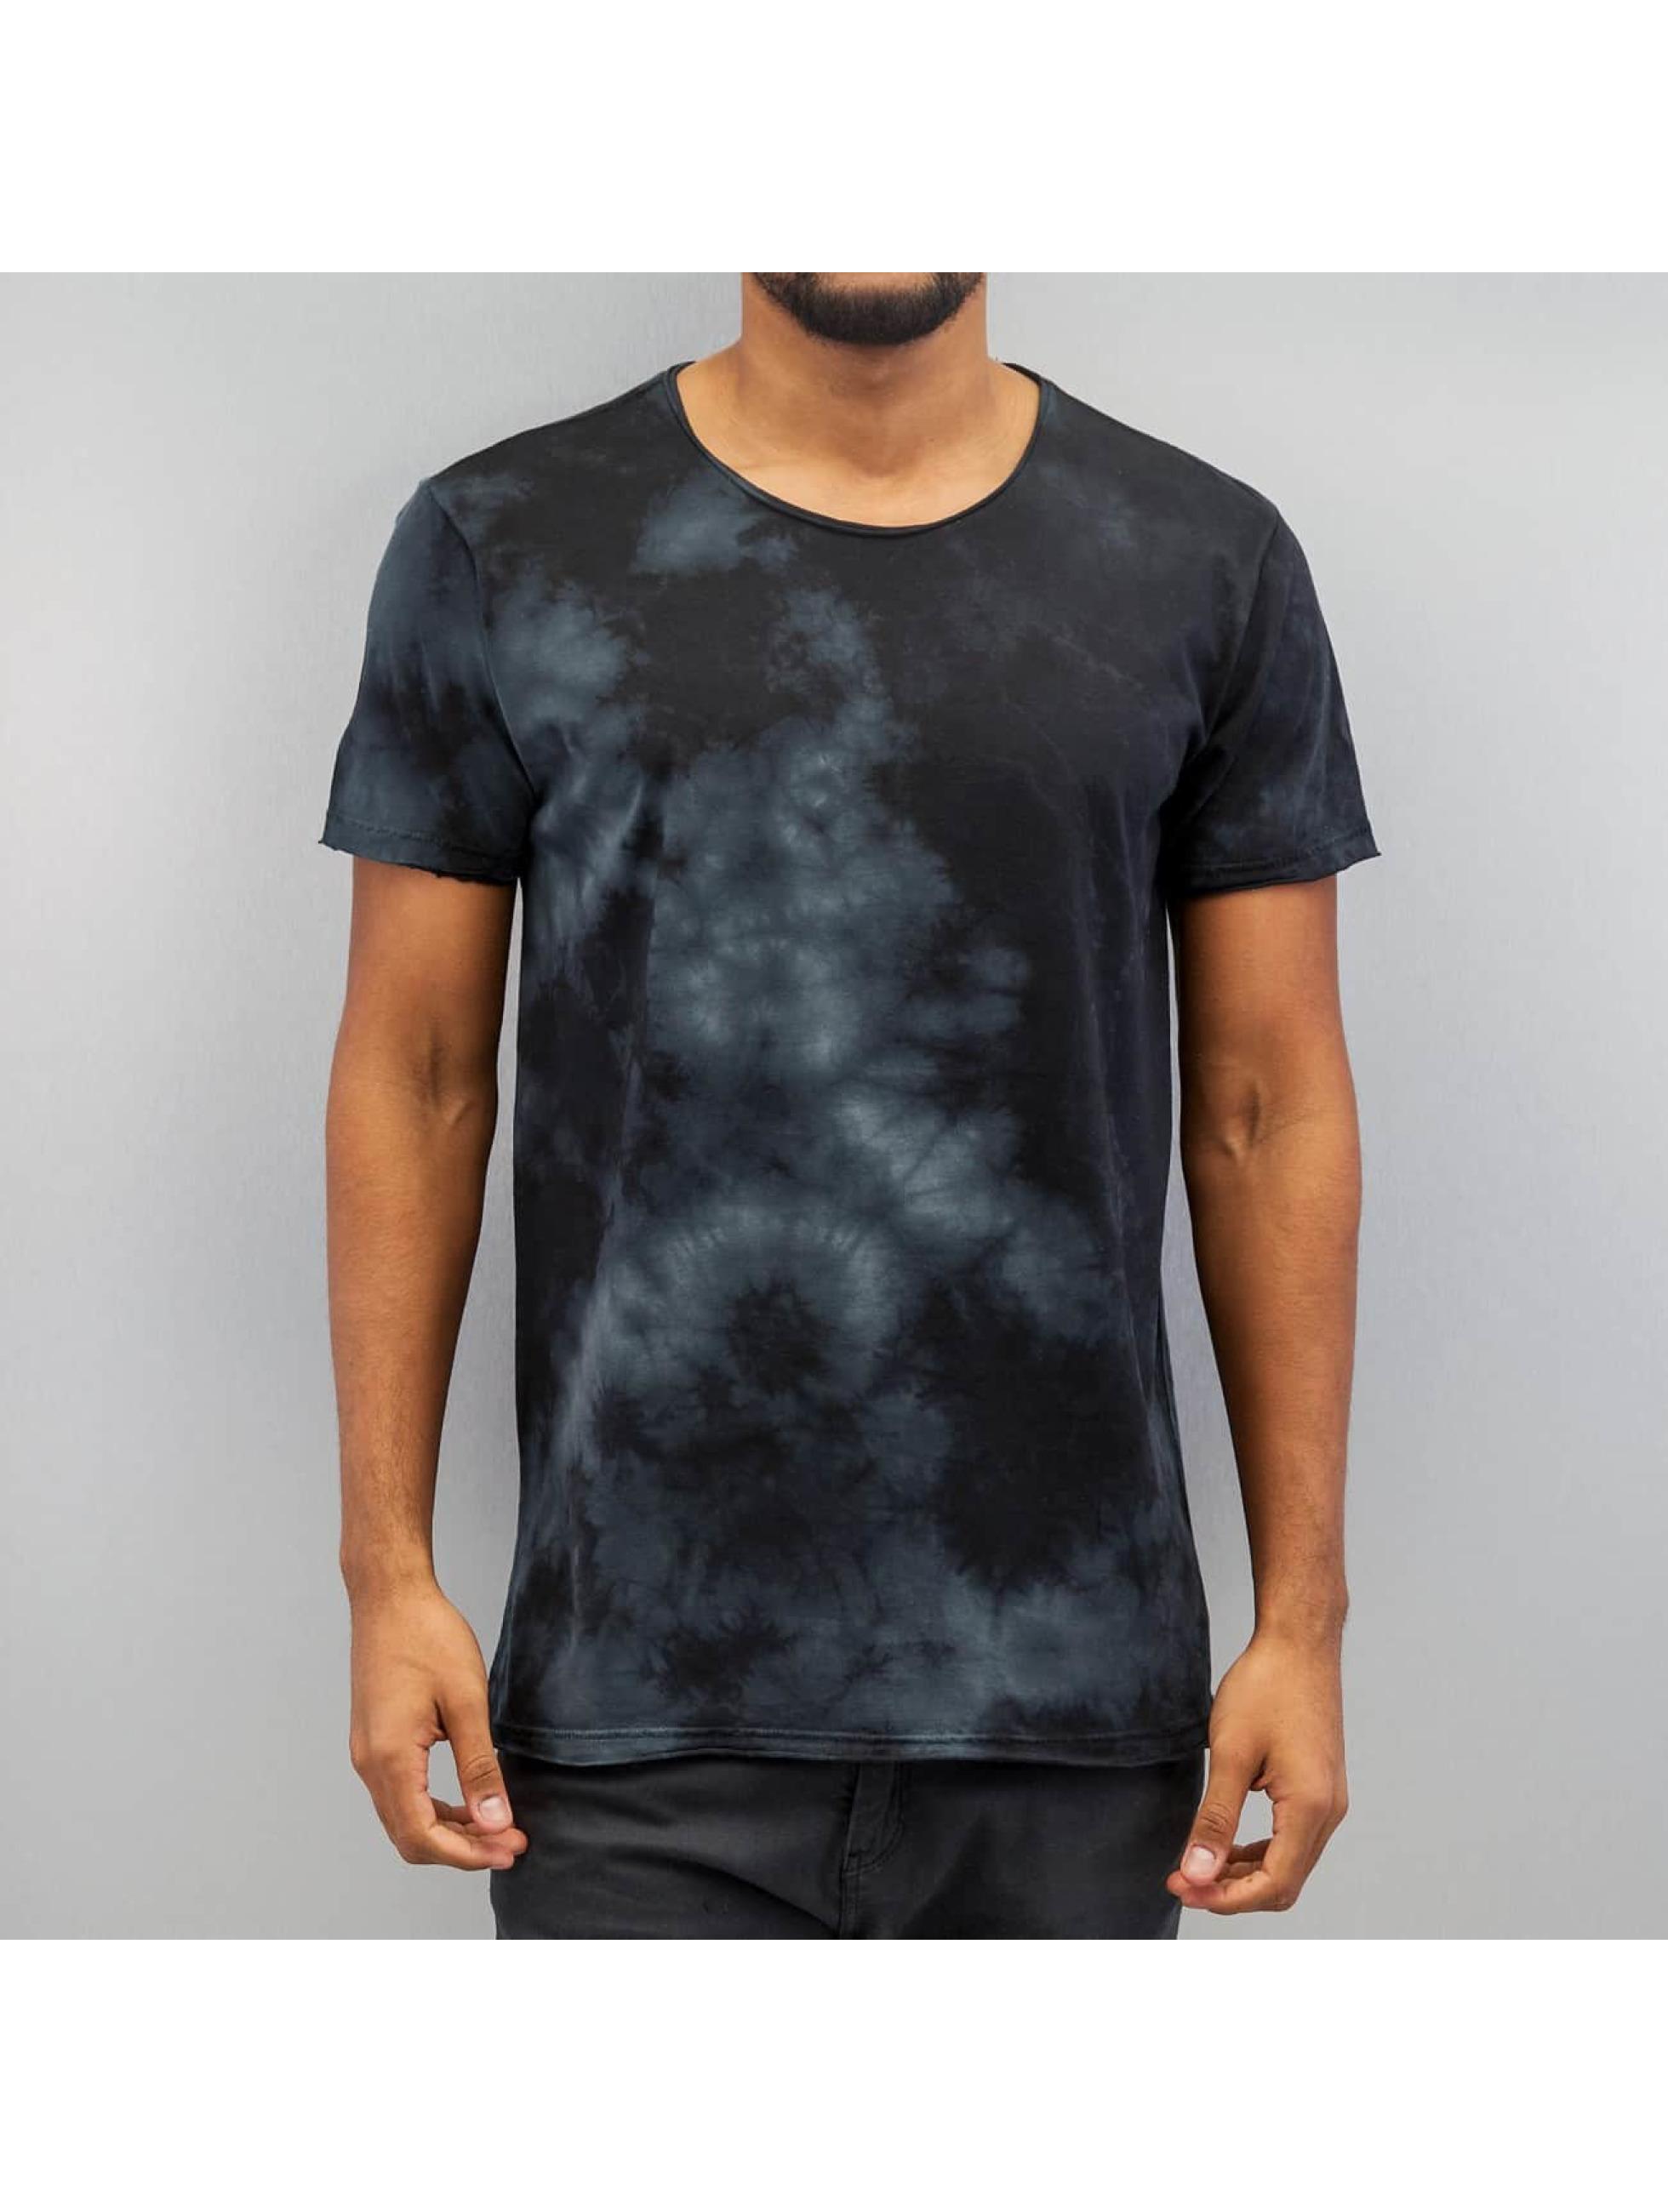 SHINE Original T-Shirt Acid Washed grey